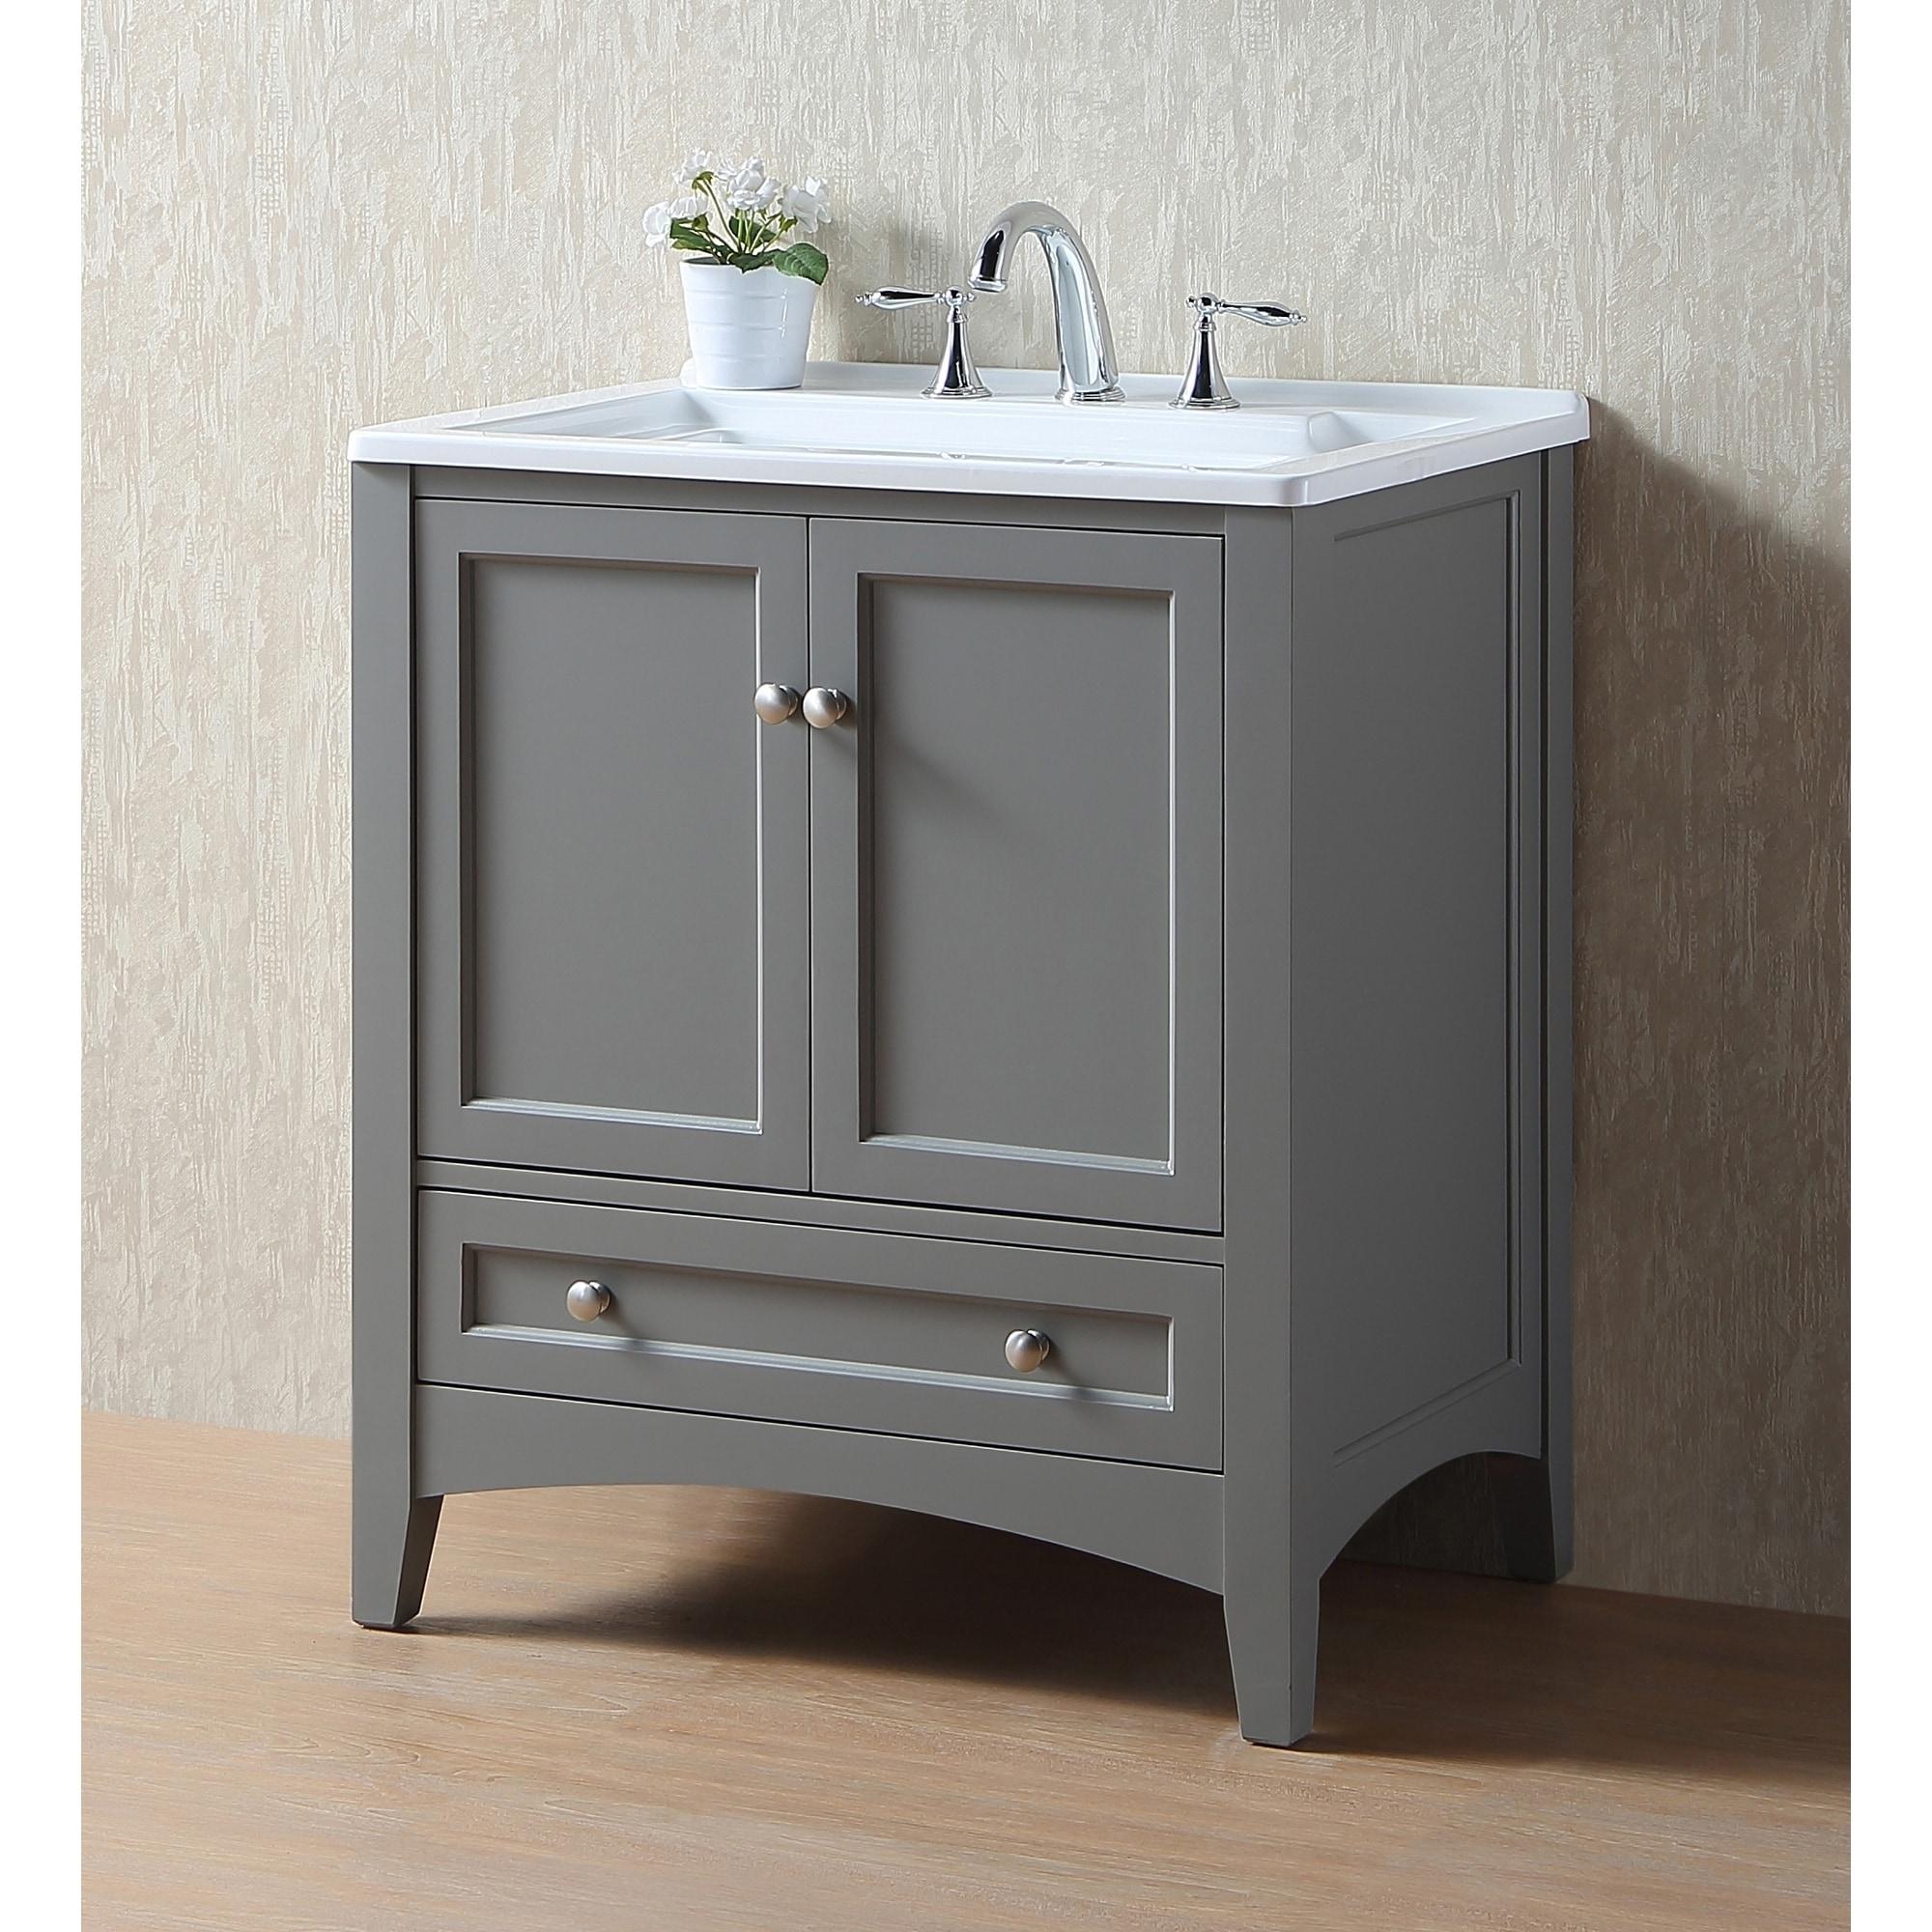 Utility Sink.Stufurhome 30 Inch Grey Laundry Utility Sink